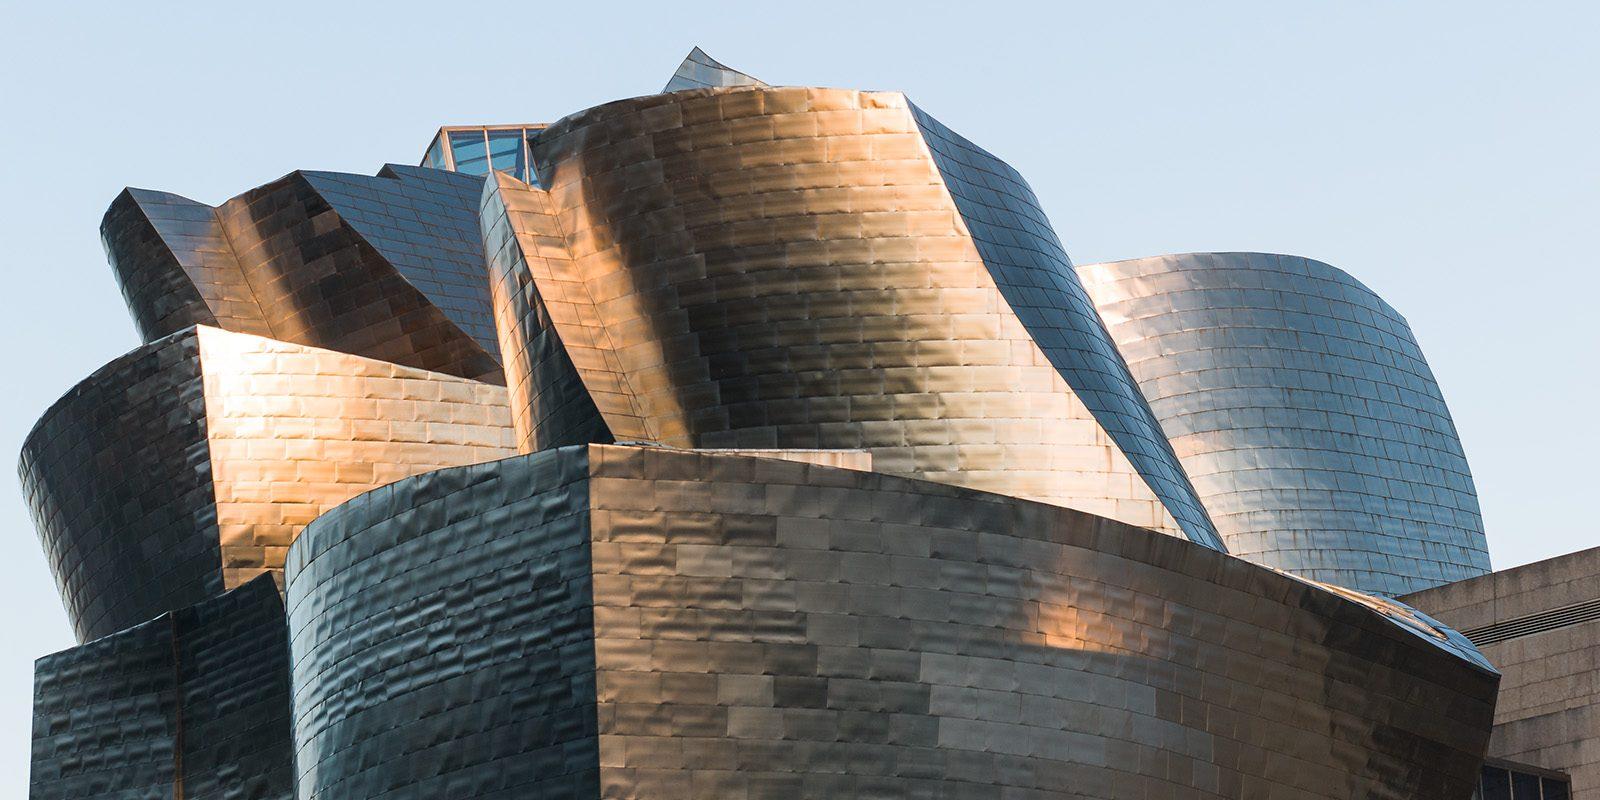 Guggenheim-museet i Bilbao av Erling Maartmann-Moe